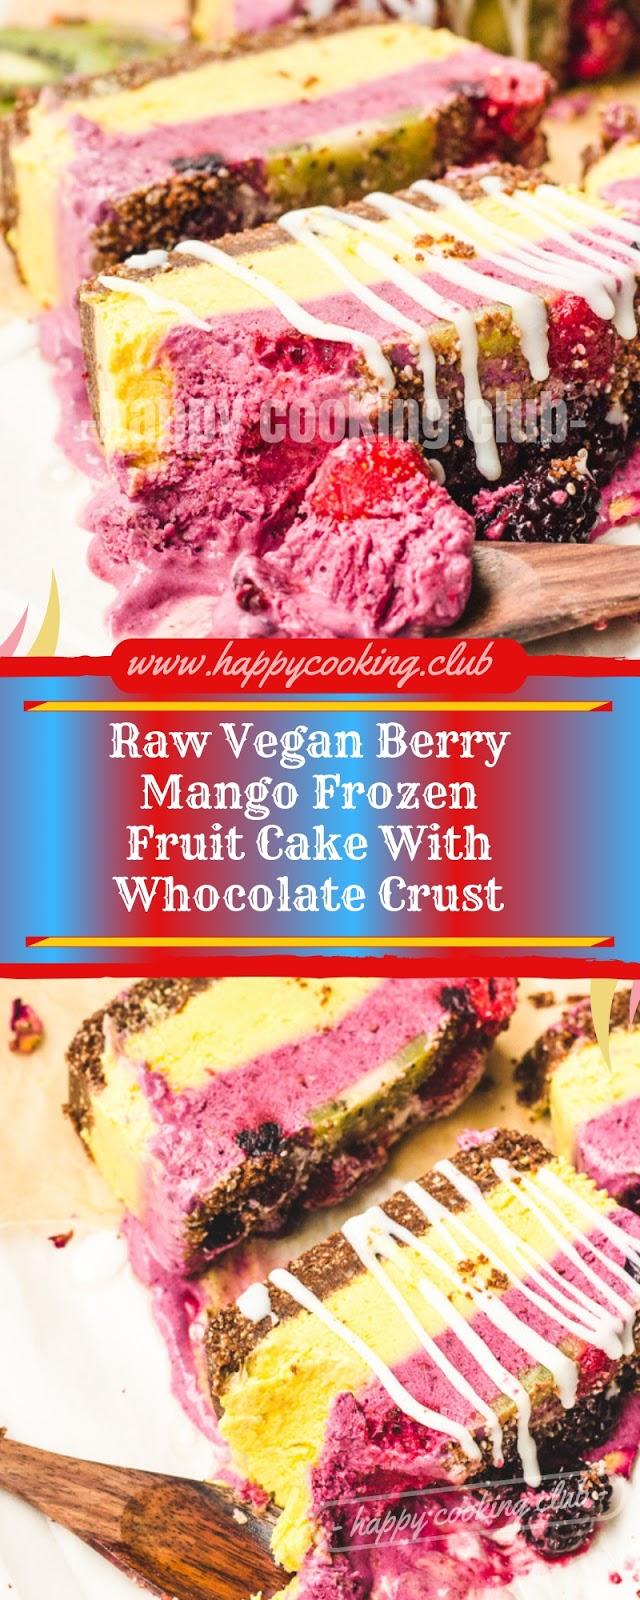 Raw Vegan Berry Mango Frozen Fruit Cake With Whocolate Crust